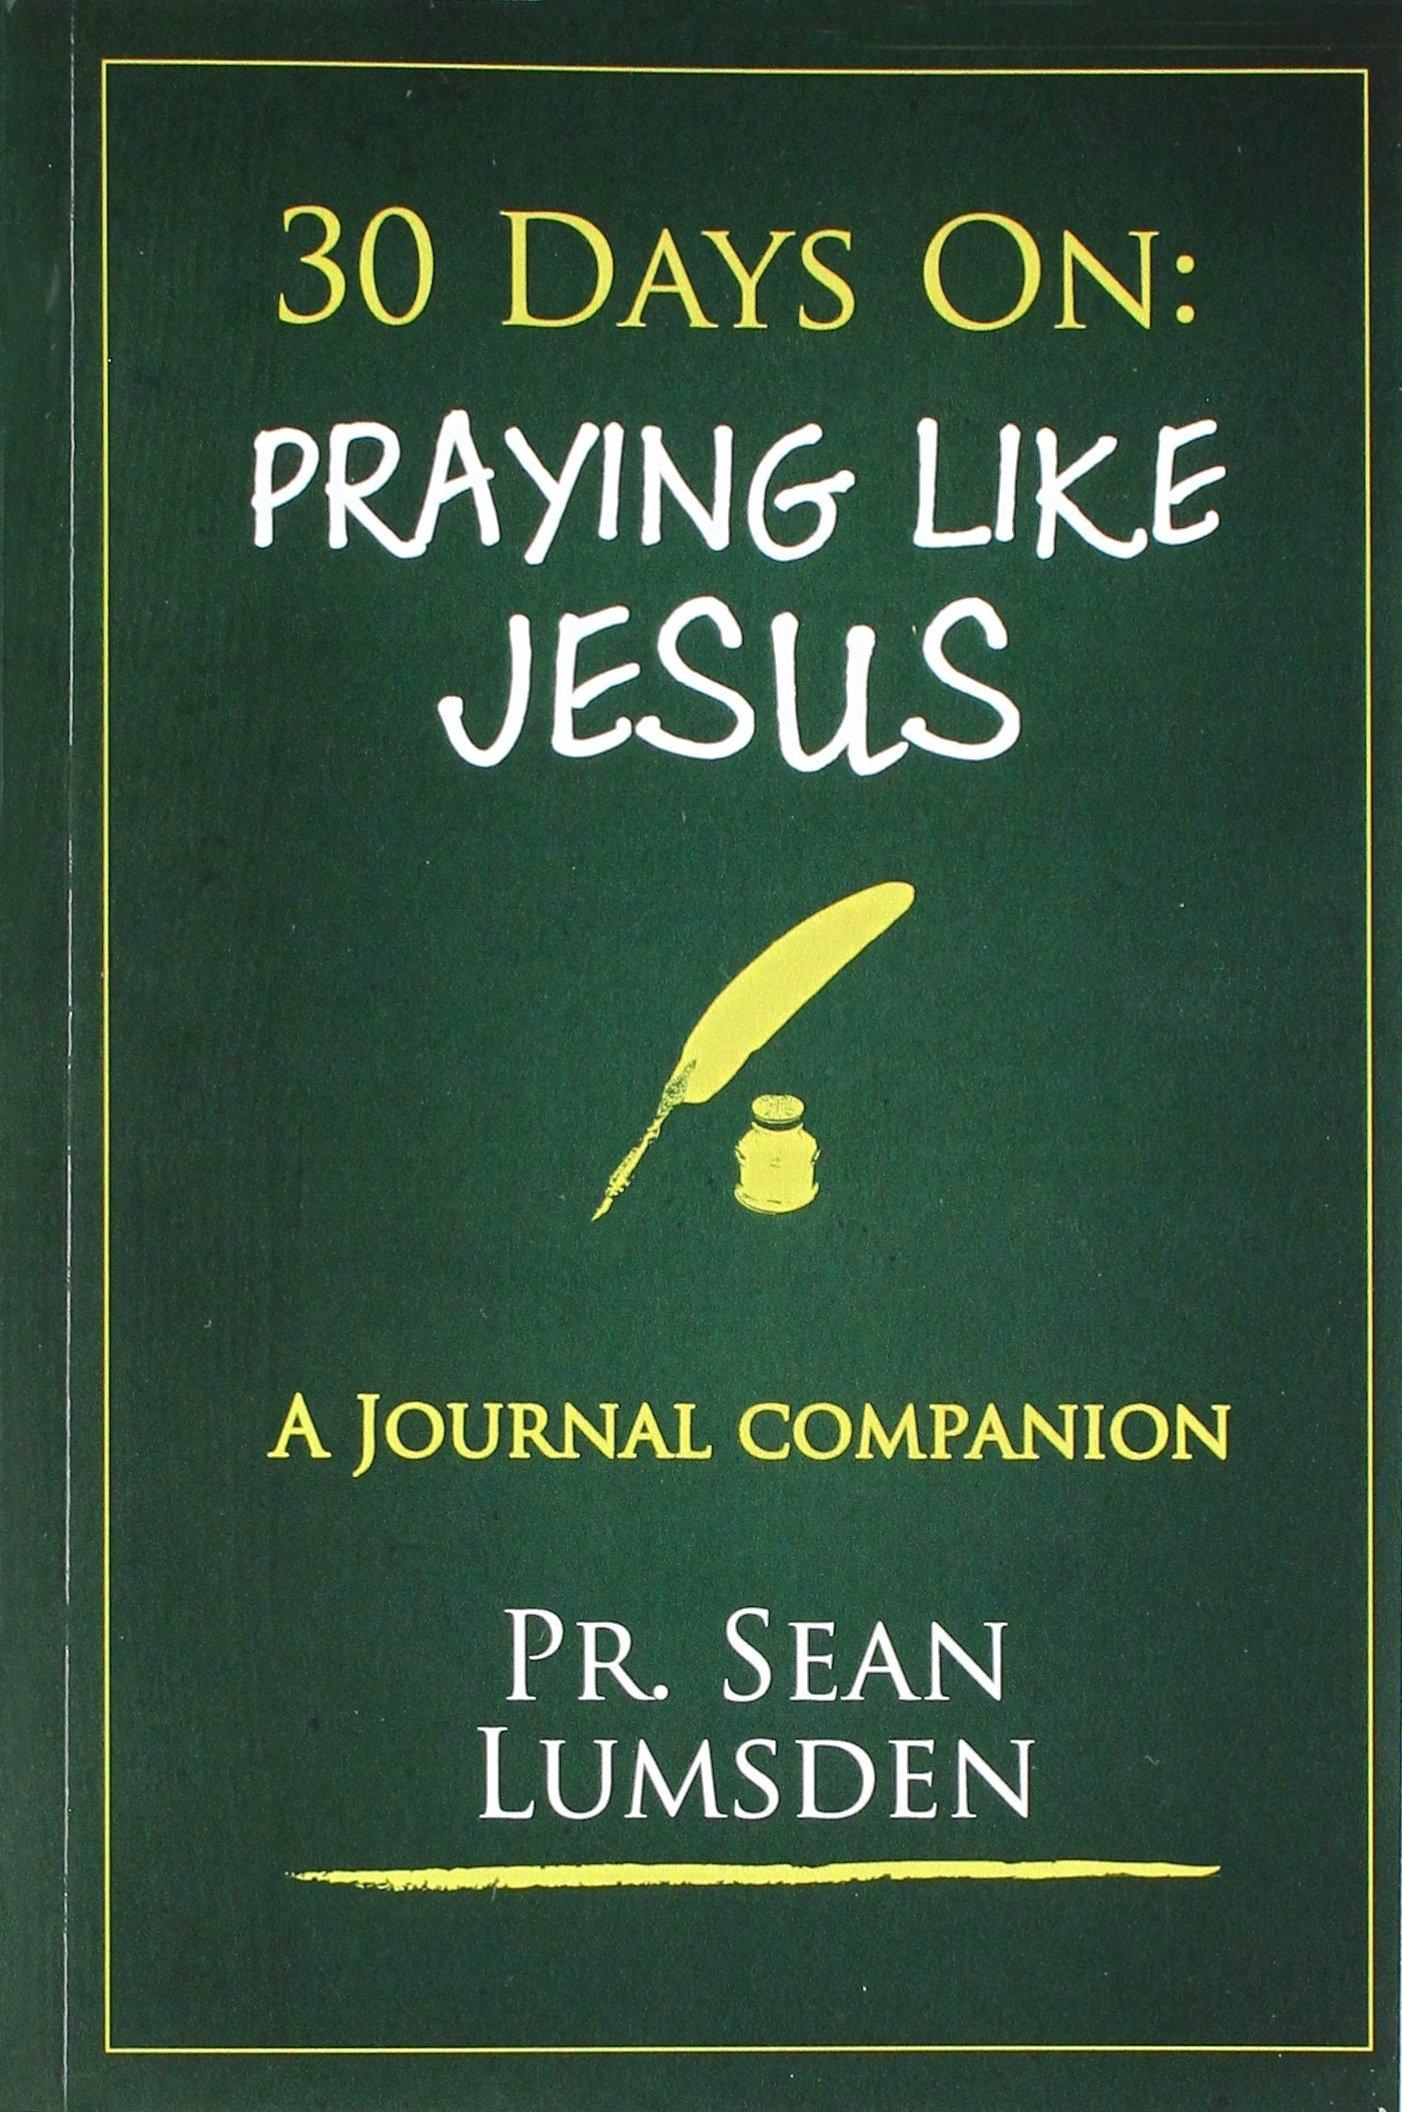 30 Days on: Praying Like Jesus: Asking Jesus For What HE Wants (Volume 2) PDF